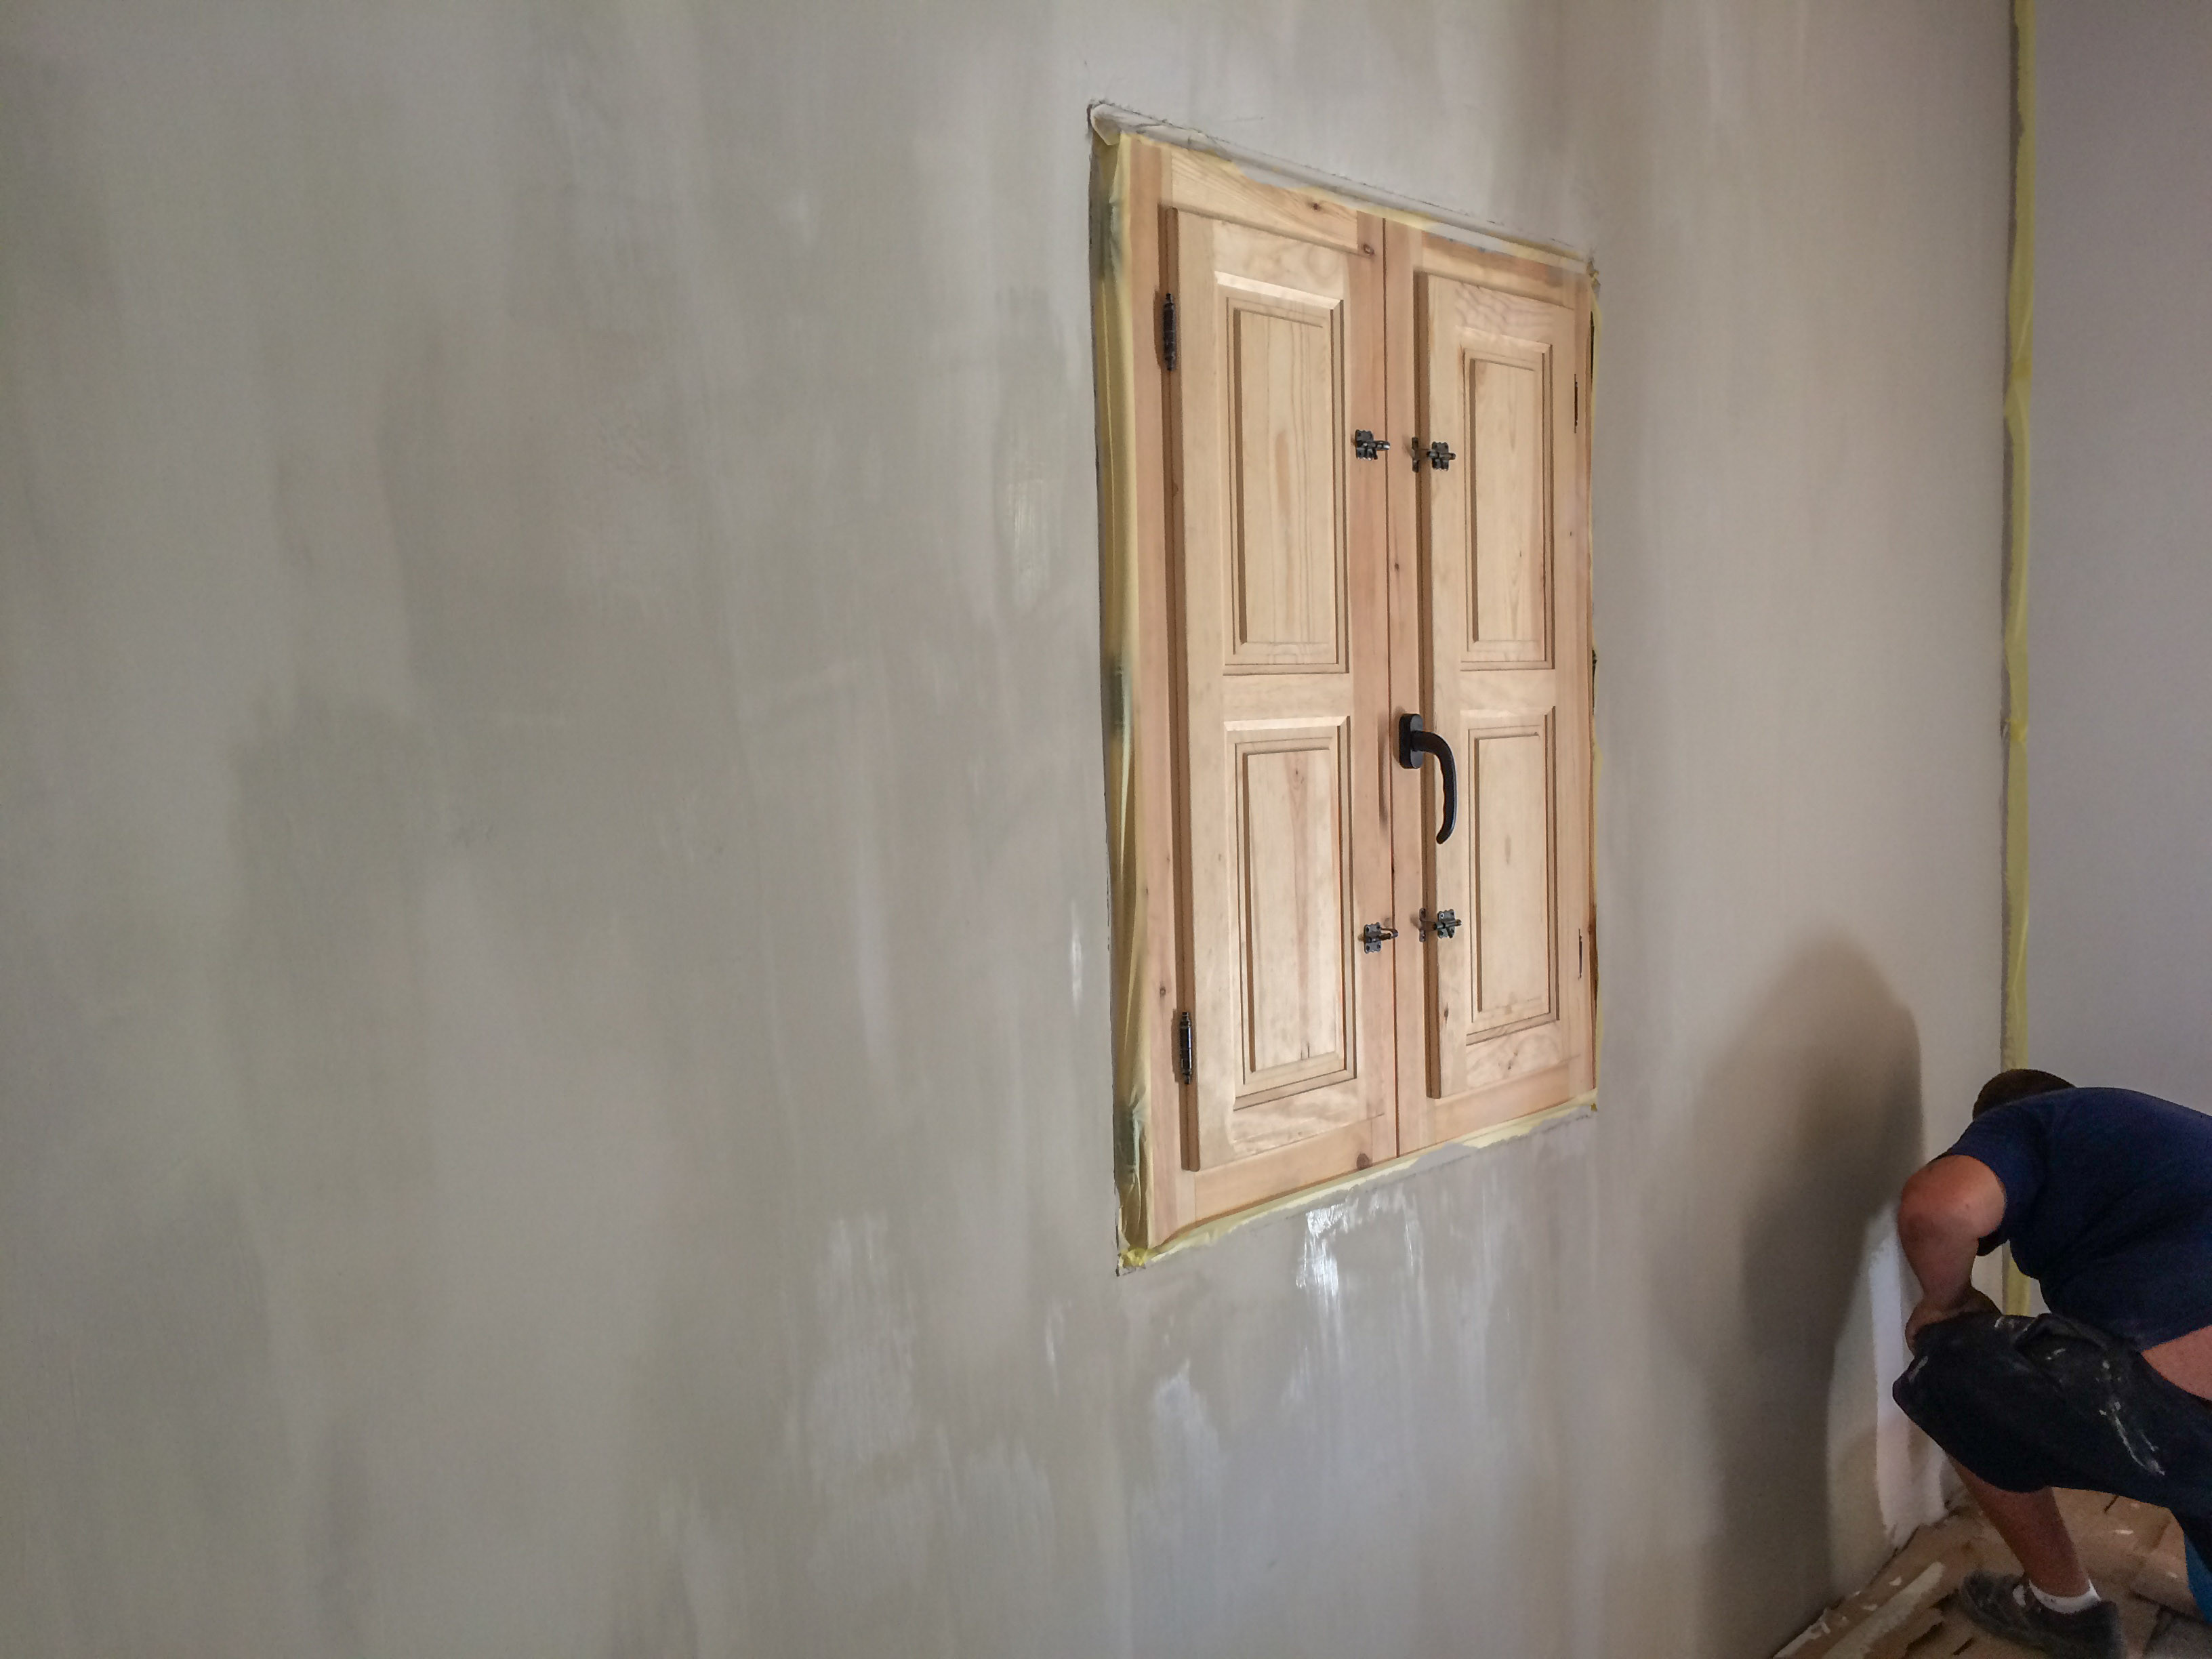 Kalkverf aanbrengen - hoe doe je dat - Maison Belle - Interieuradvies